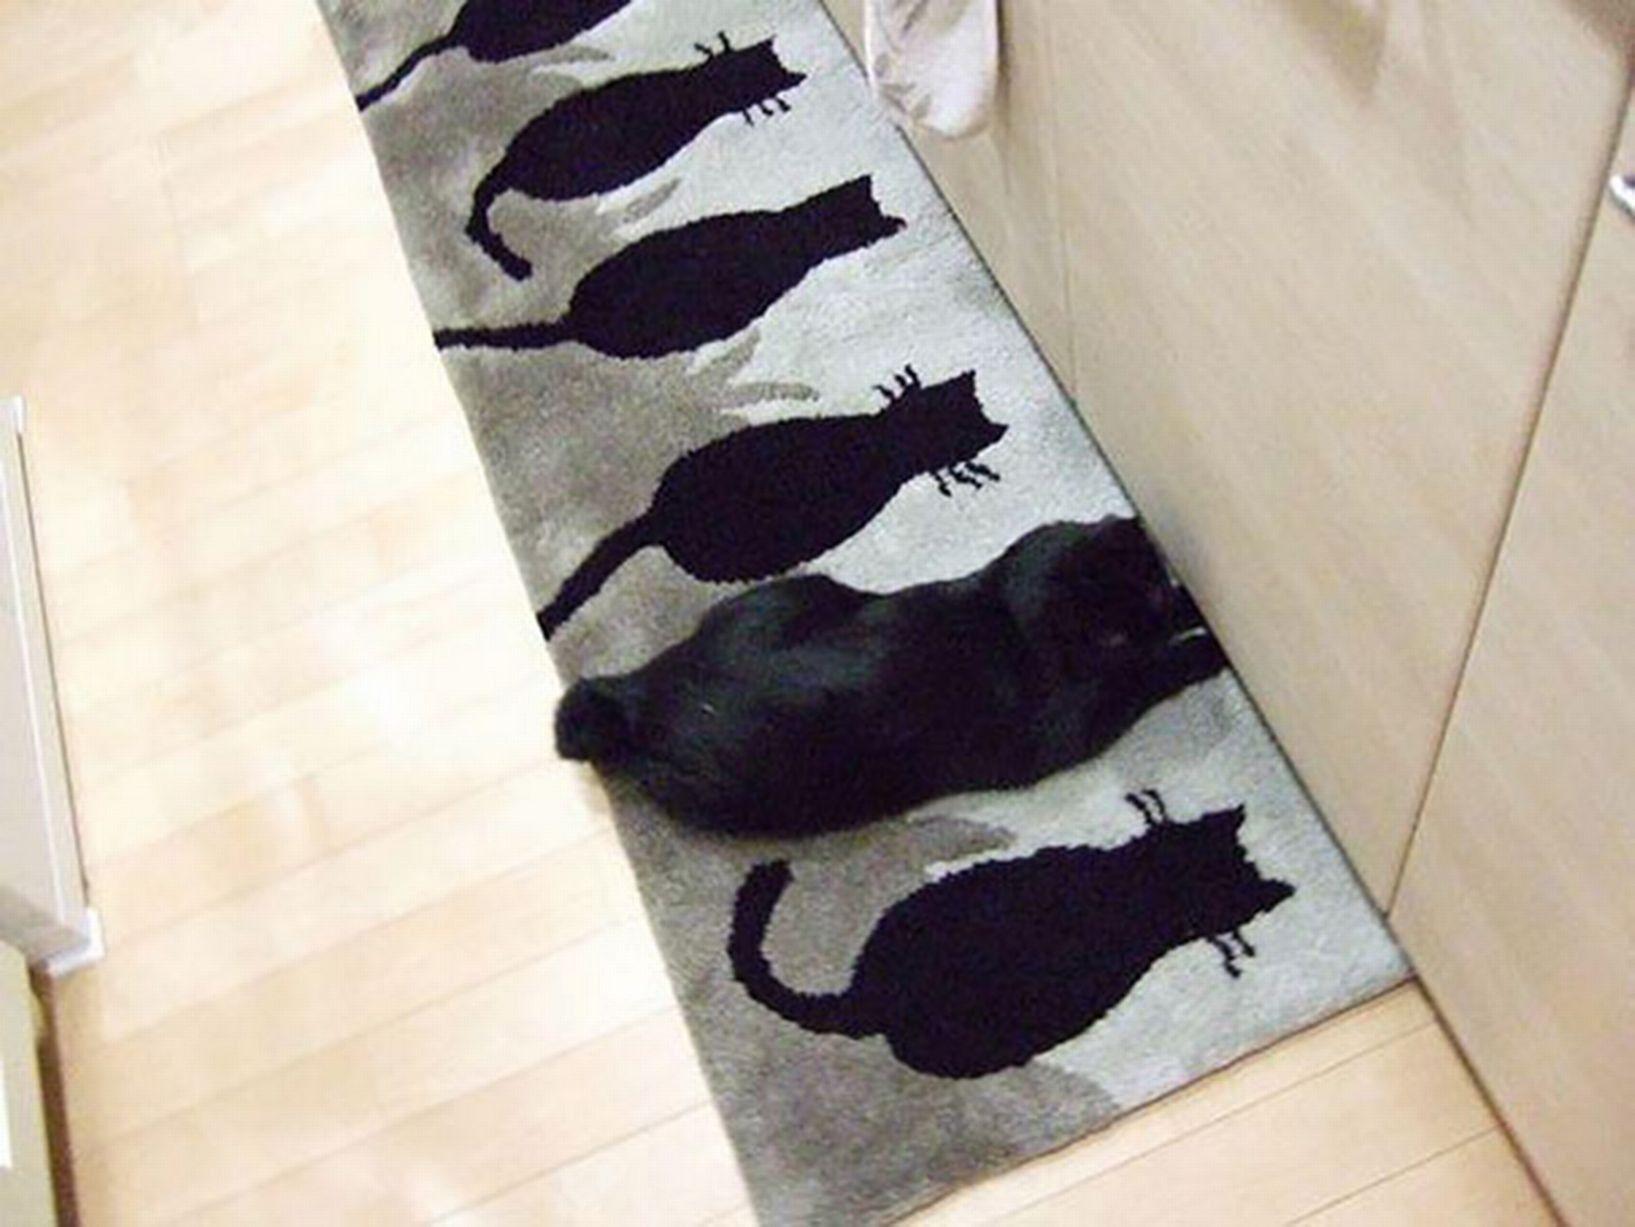 kamuflase kucing9 - 13 Aksi Kamuflase Kucing Yang Menggemaskan. Kamu Bisa Melihatnya ?